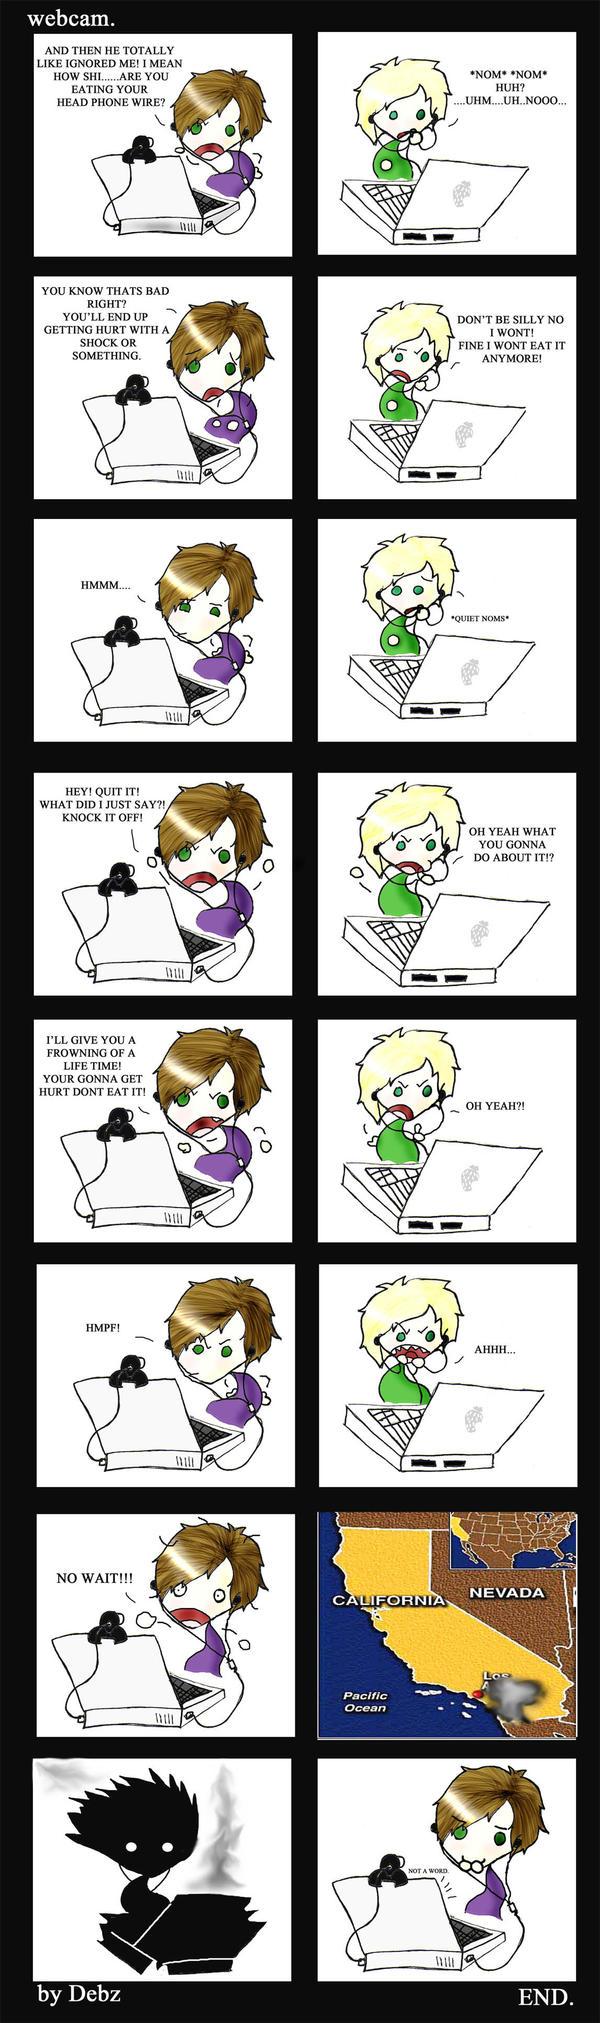 Webcam comic by nuttydragon